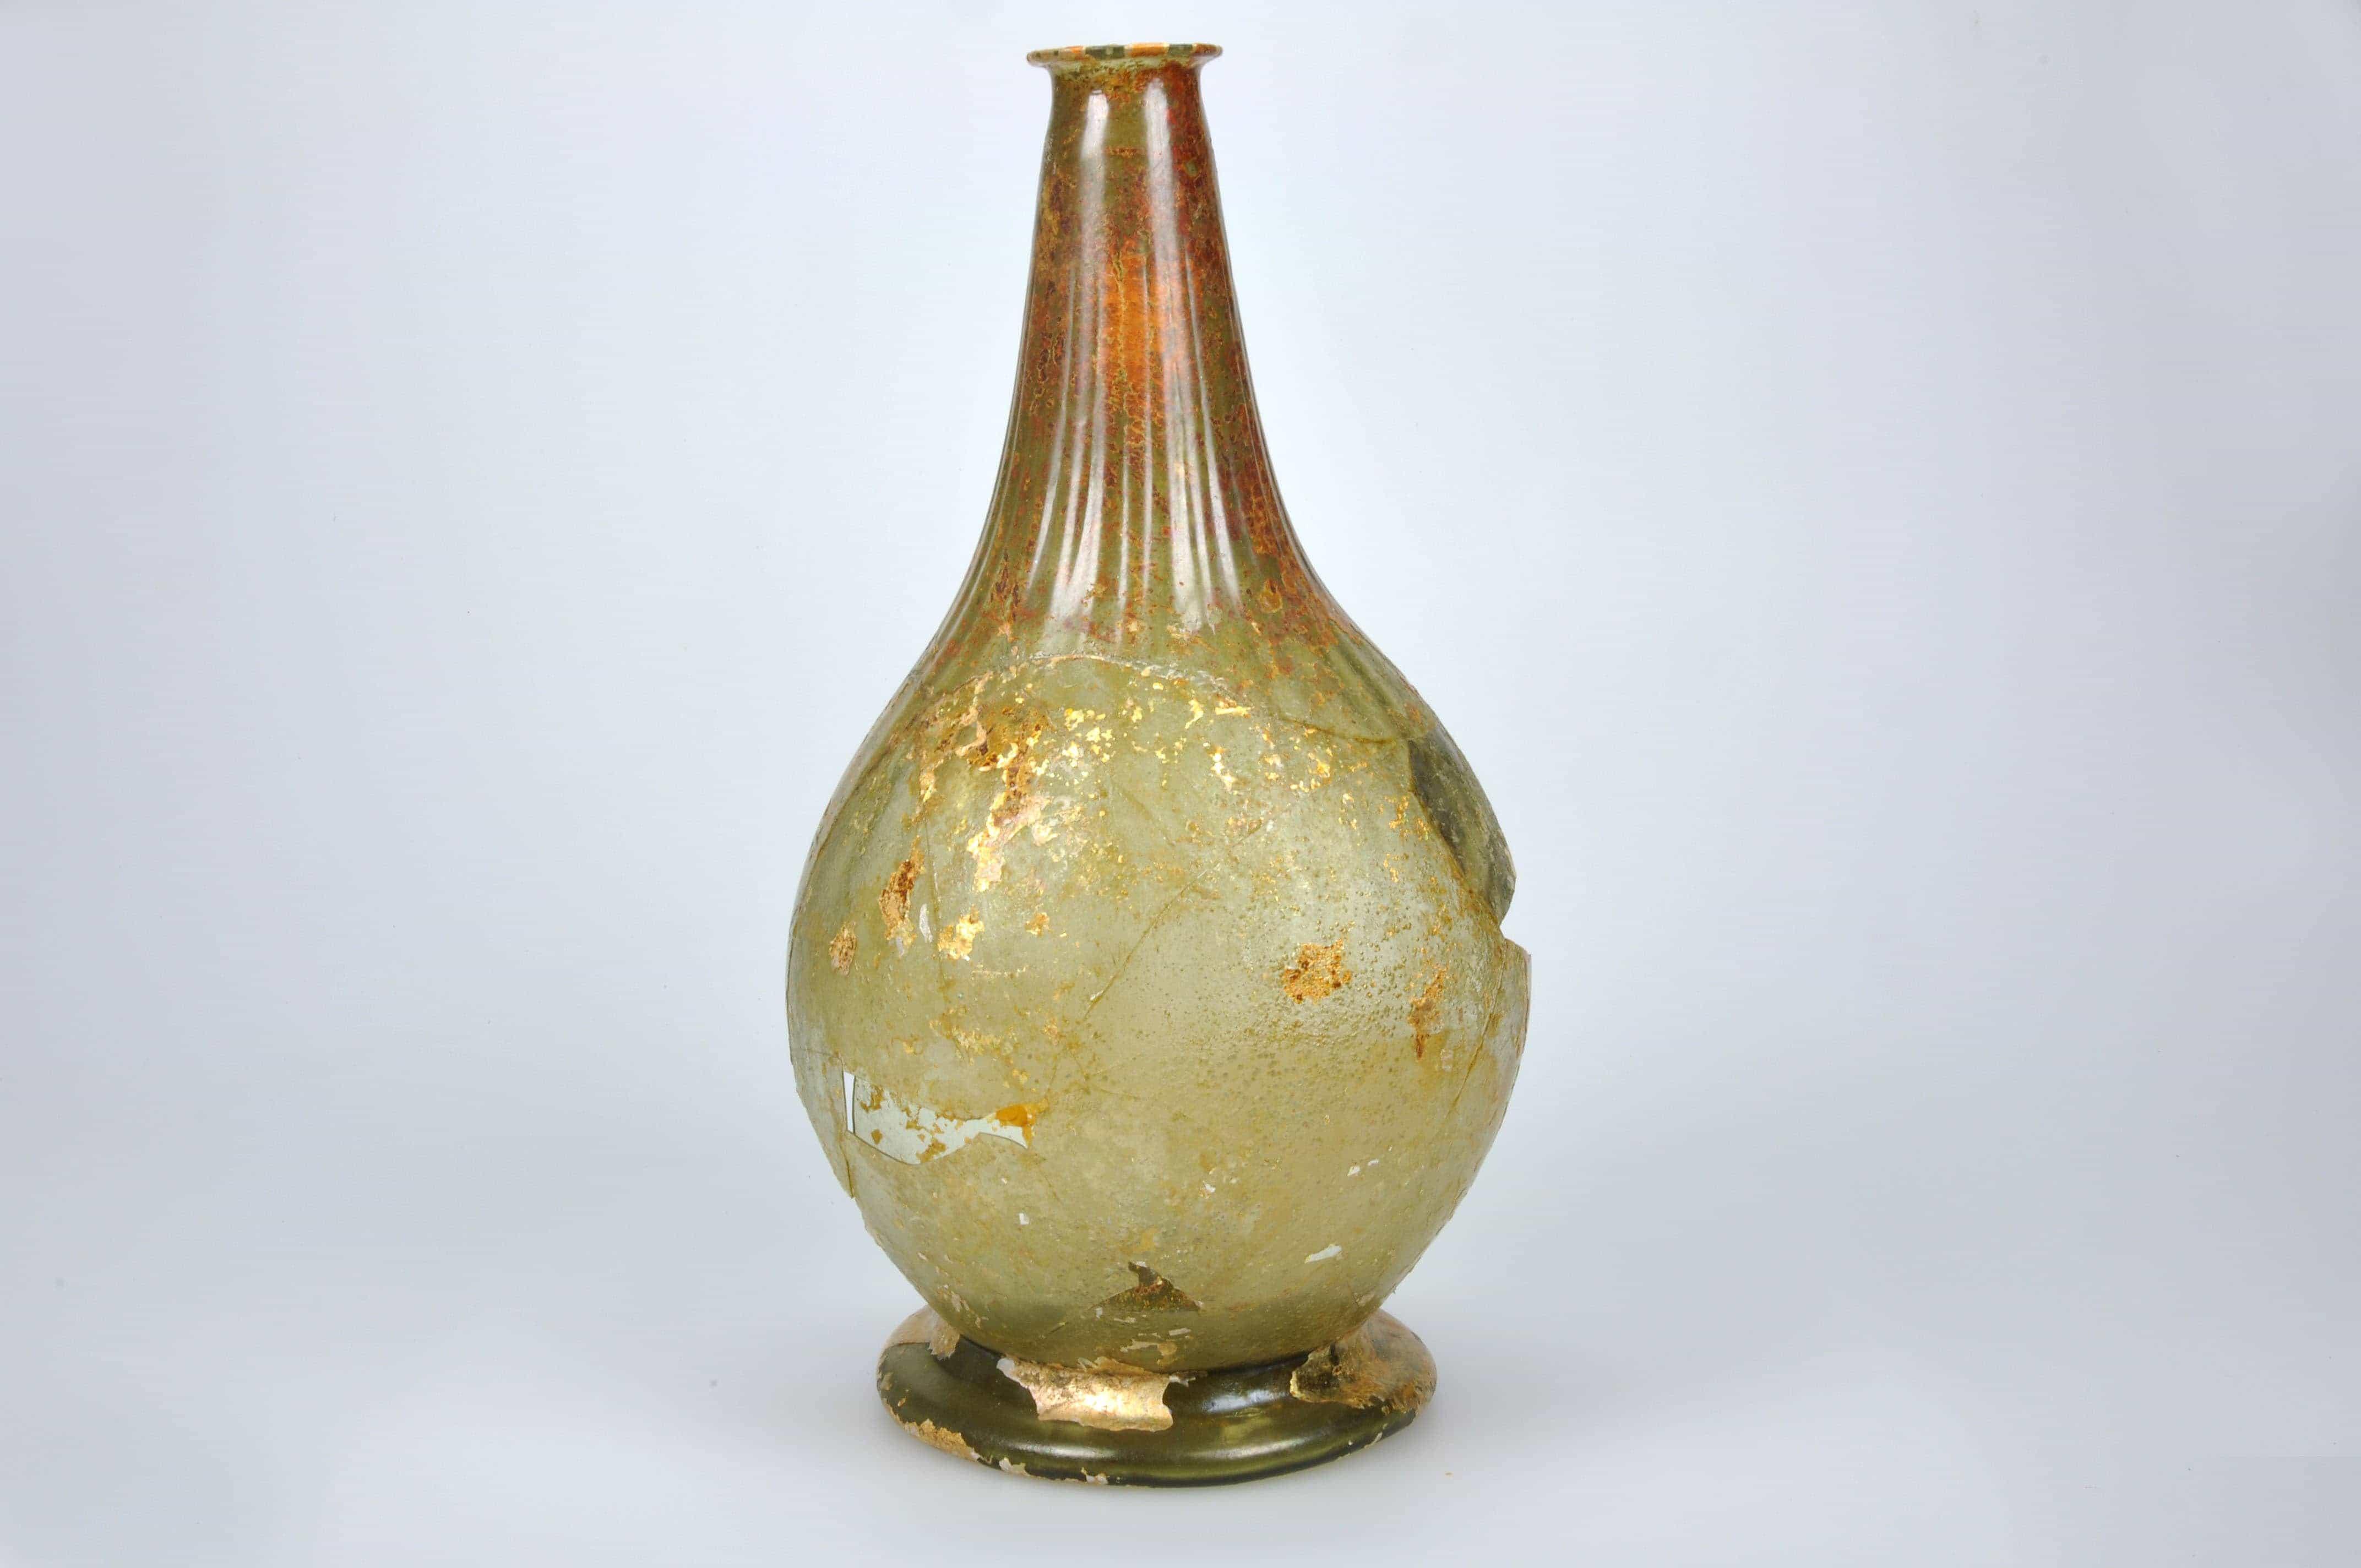 Fles 1400-1500